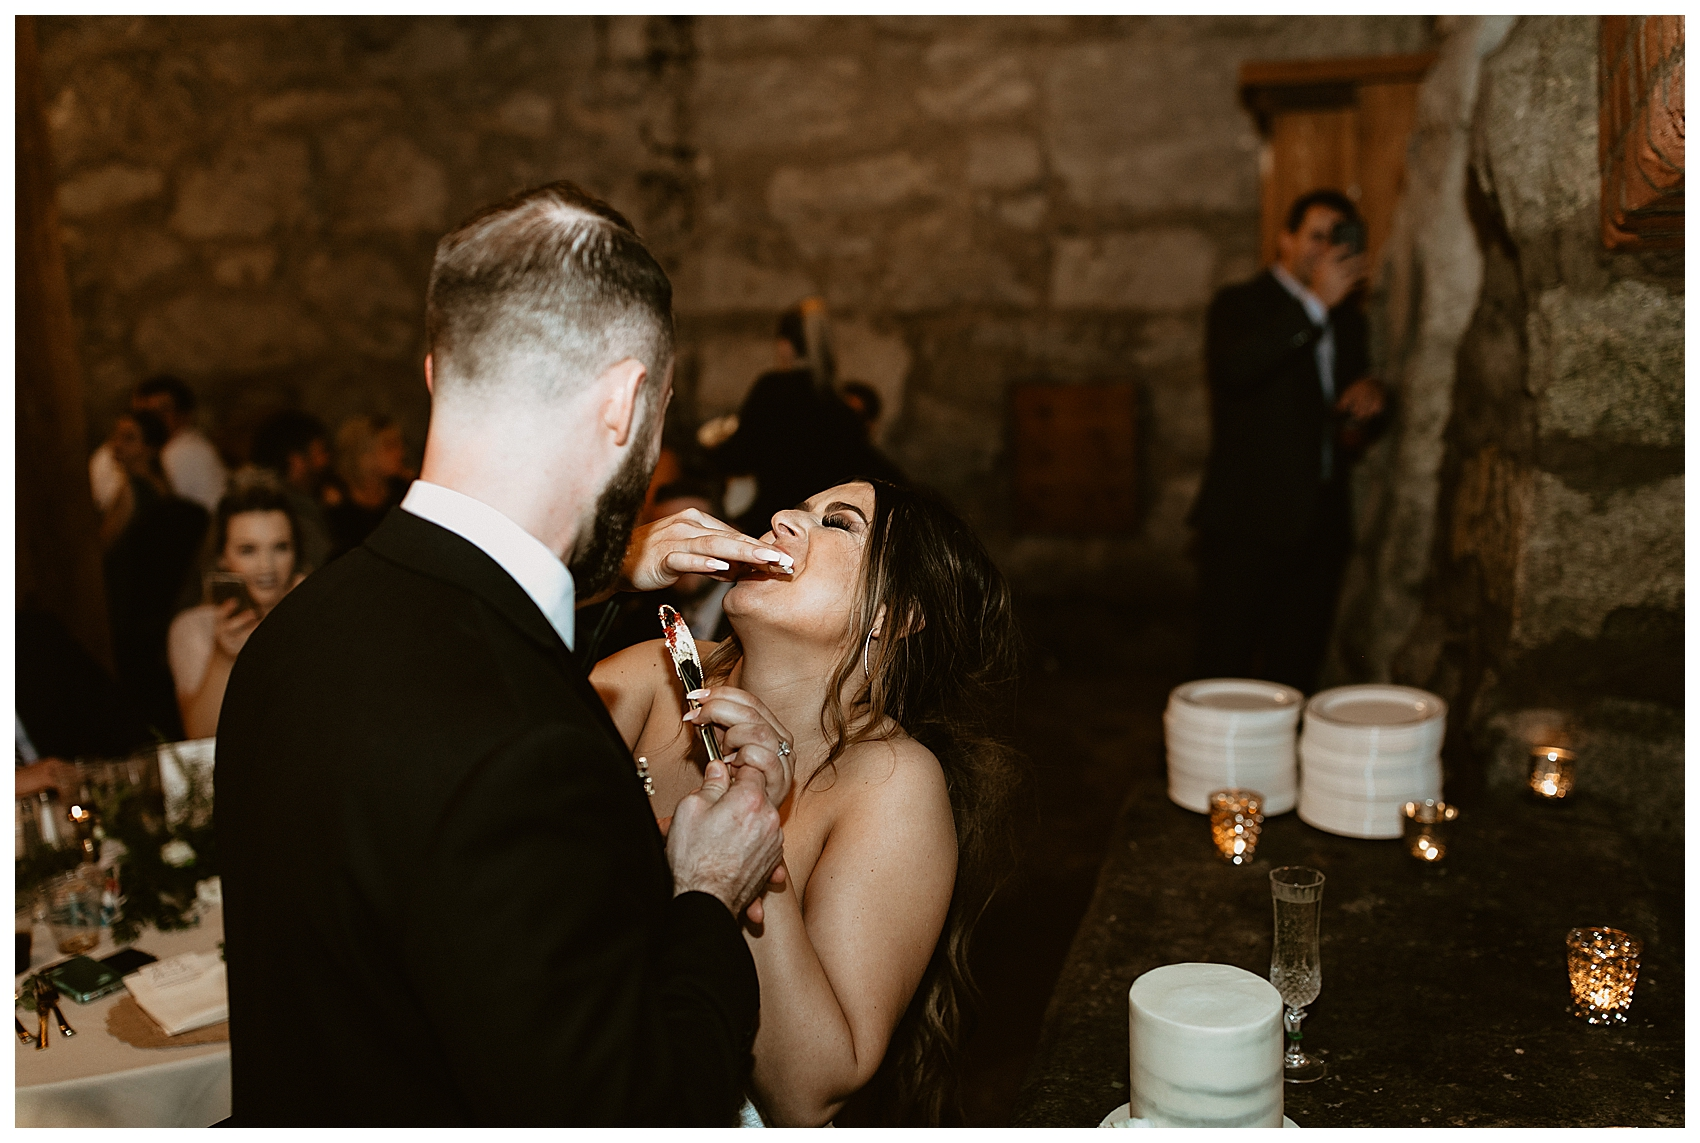 Chateau Rive Spokane Wedding Cassie Trottier Photography01106.jpg